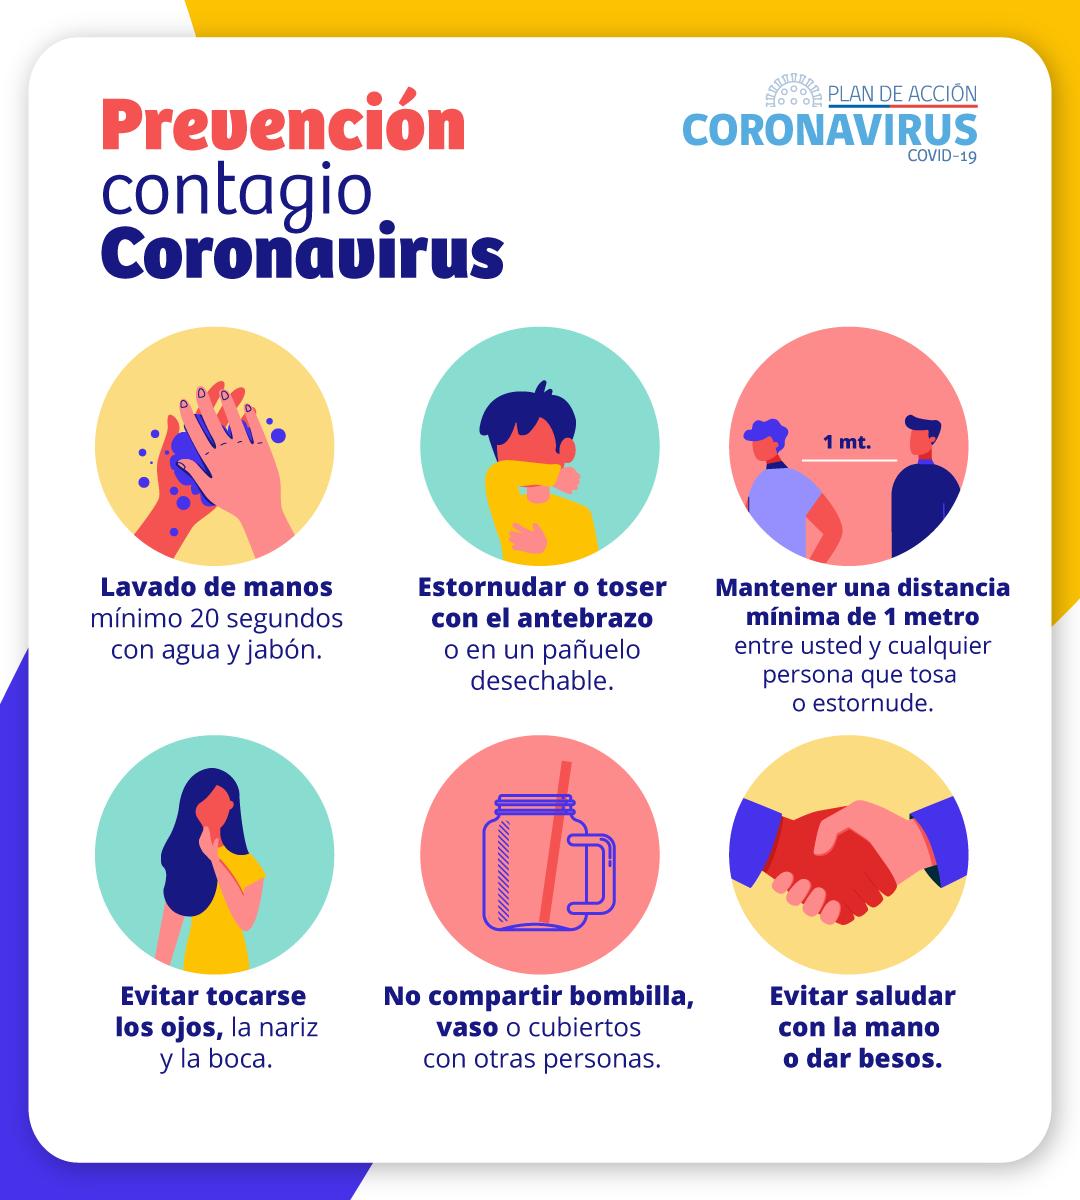 prevencion-contagio.png